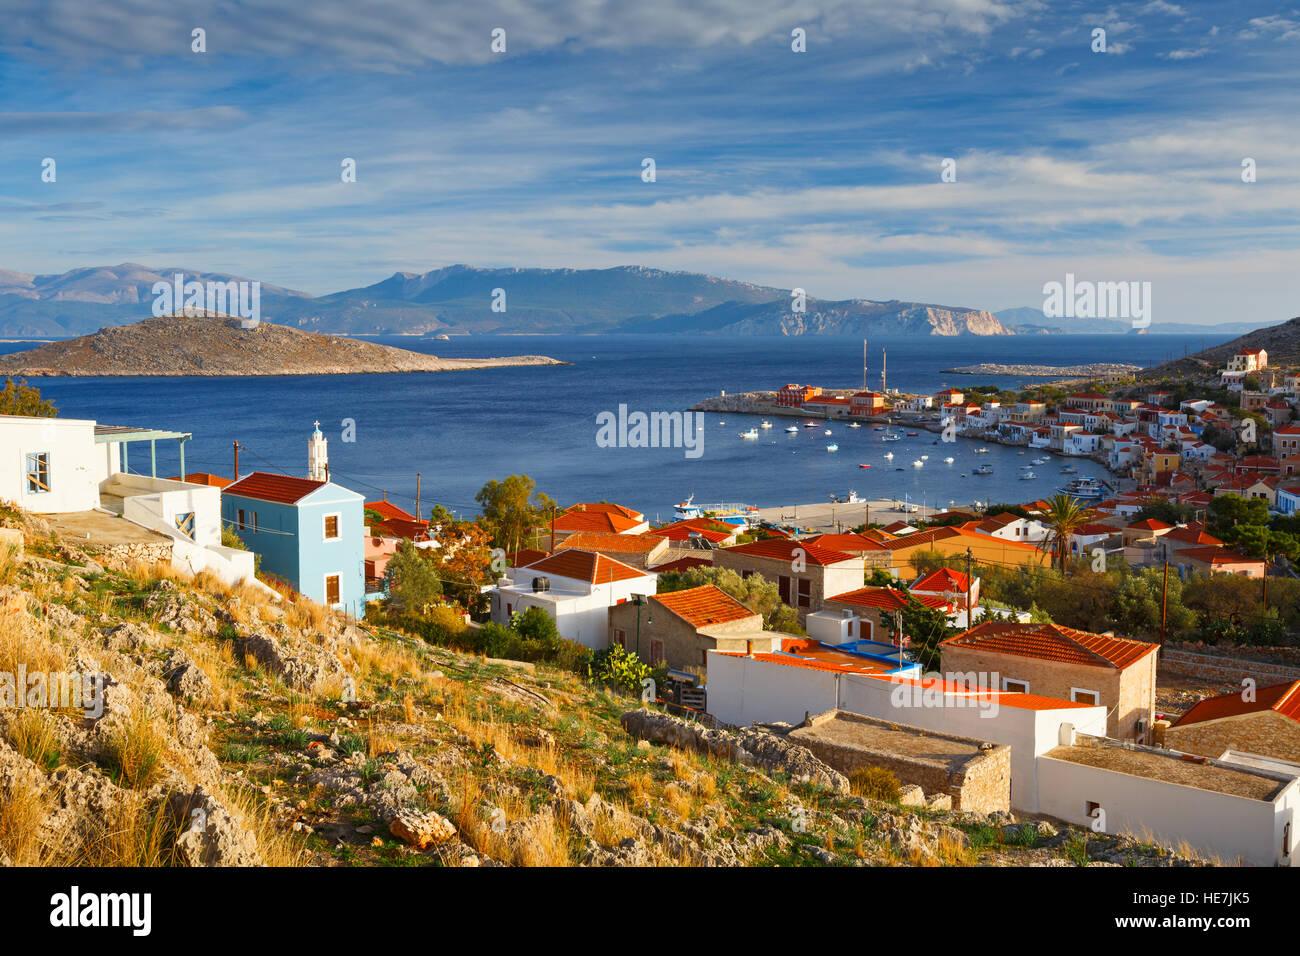 Halki island in Dodecanese archipelago, Greece. - Stock Image